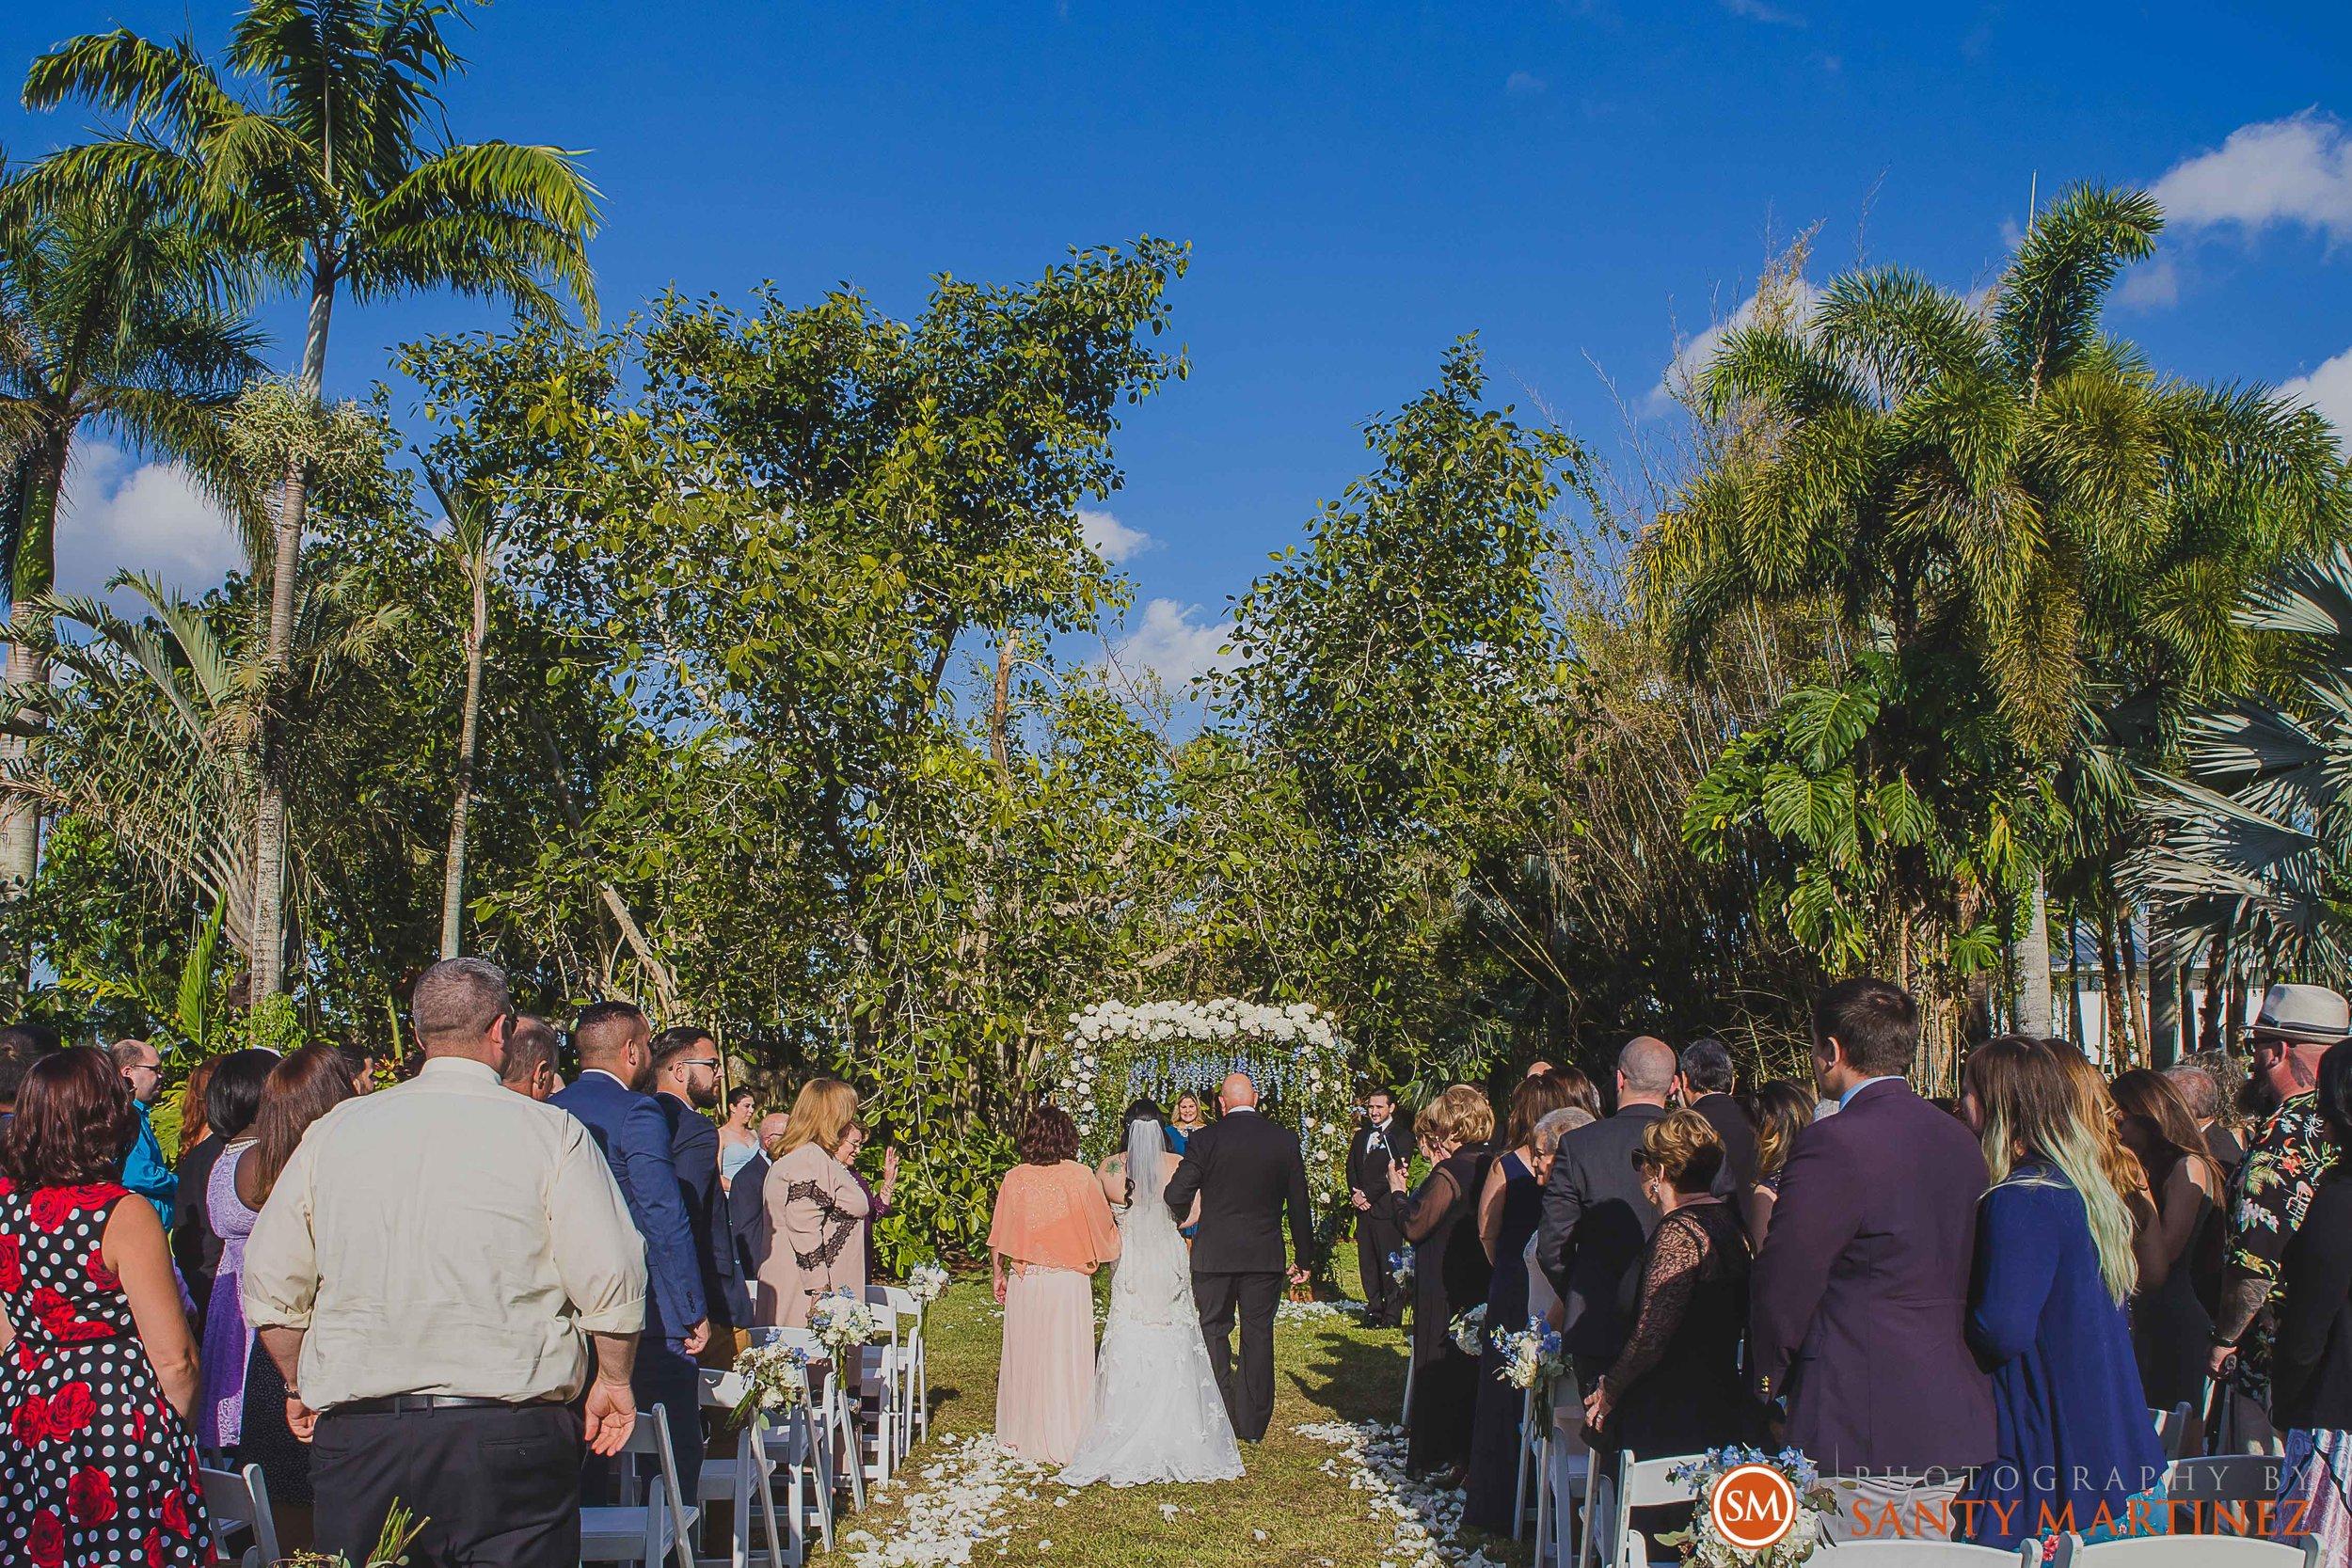 Wedding - Whimsical key West House - Photography by Santy Martinez-17.jpg